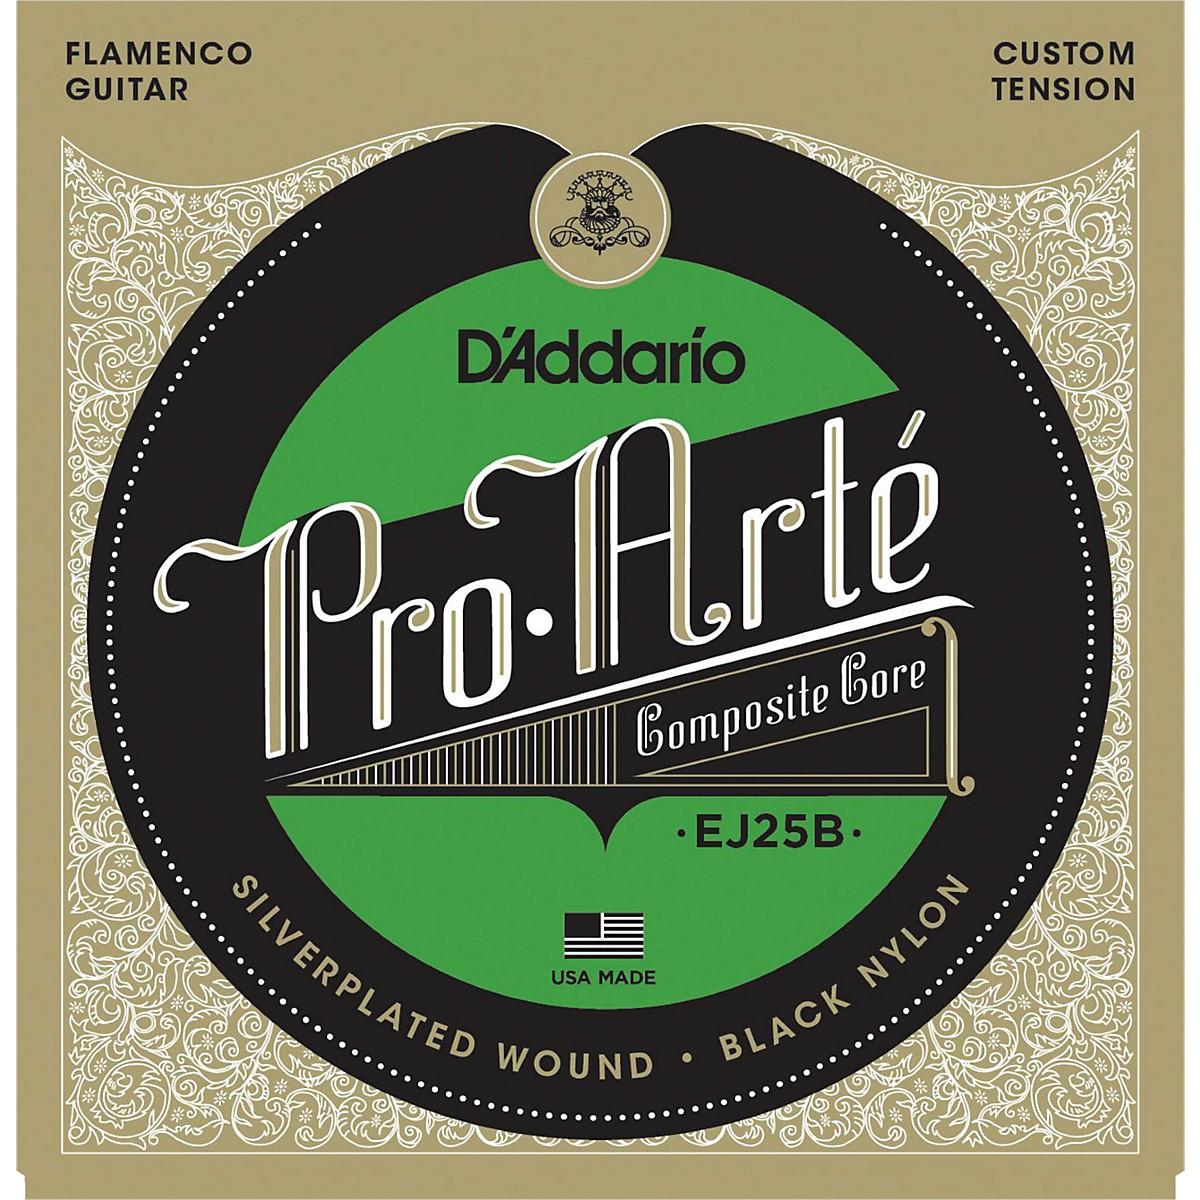 D'Addario EJ25B Pro-Arte Composites Flamenco Guitar Strings - Black Nylon